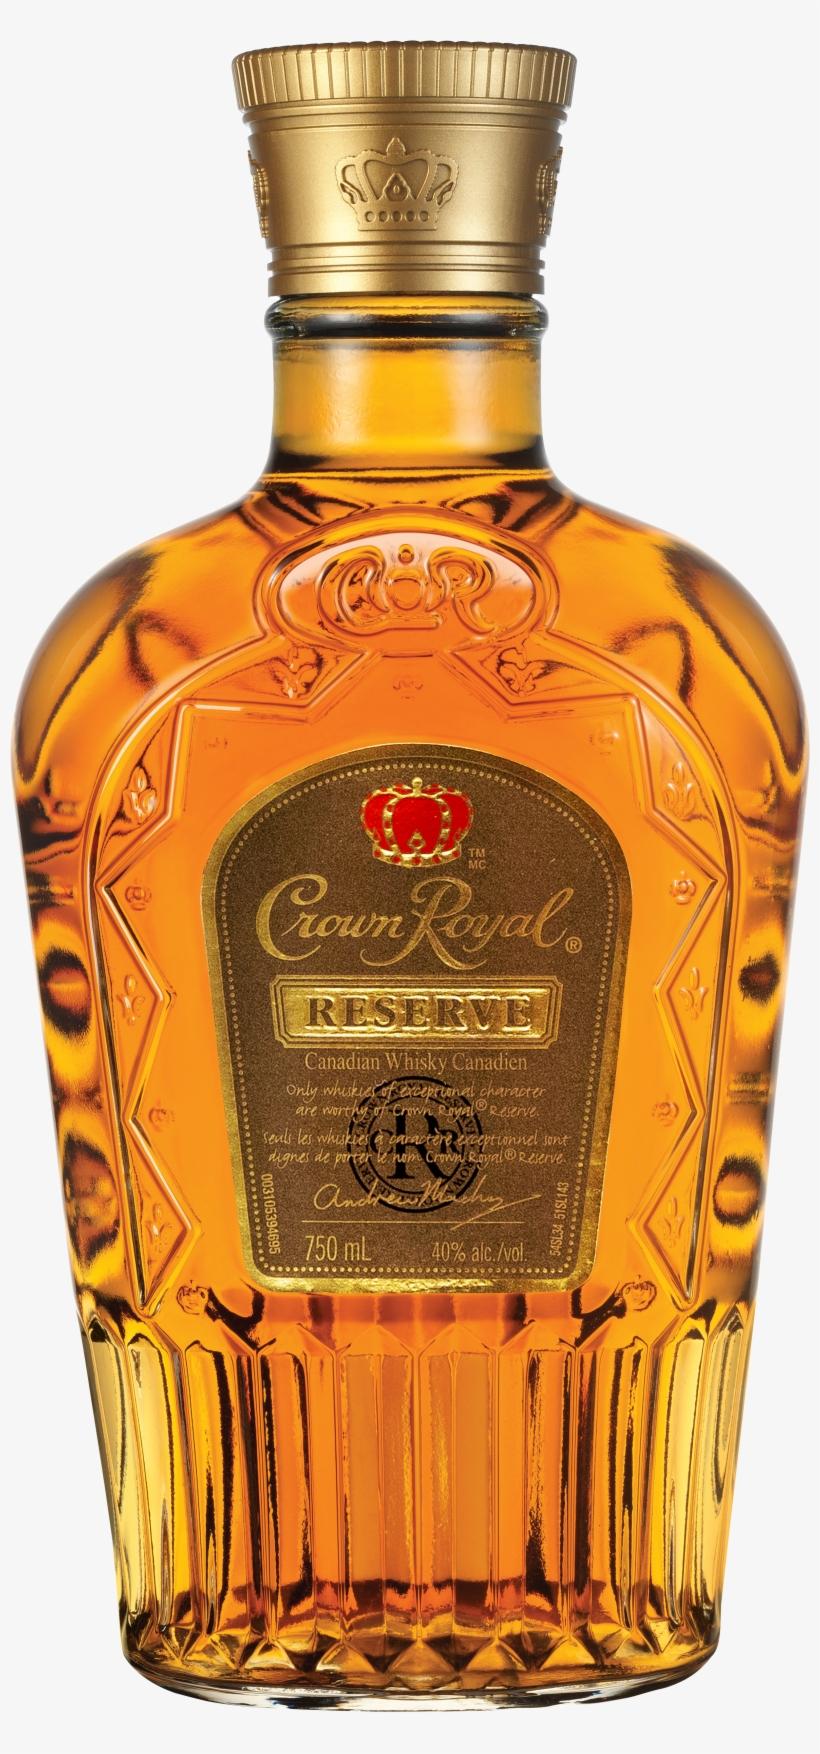 Crown Royal Reserve Canadian Whisky - Crown Royal Reserve Whisky, transparent png #1149014